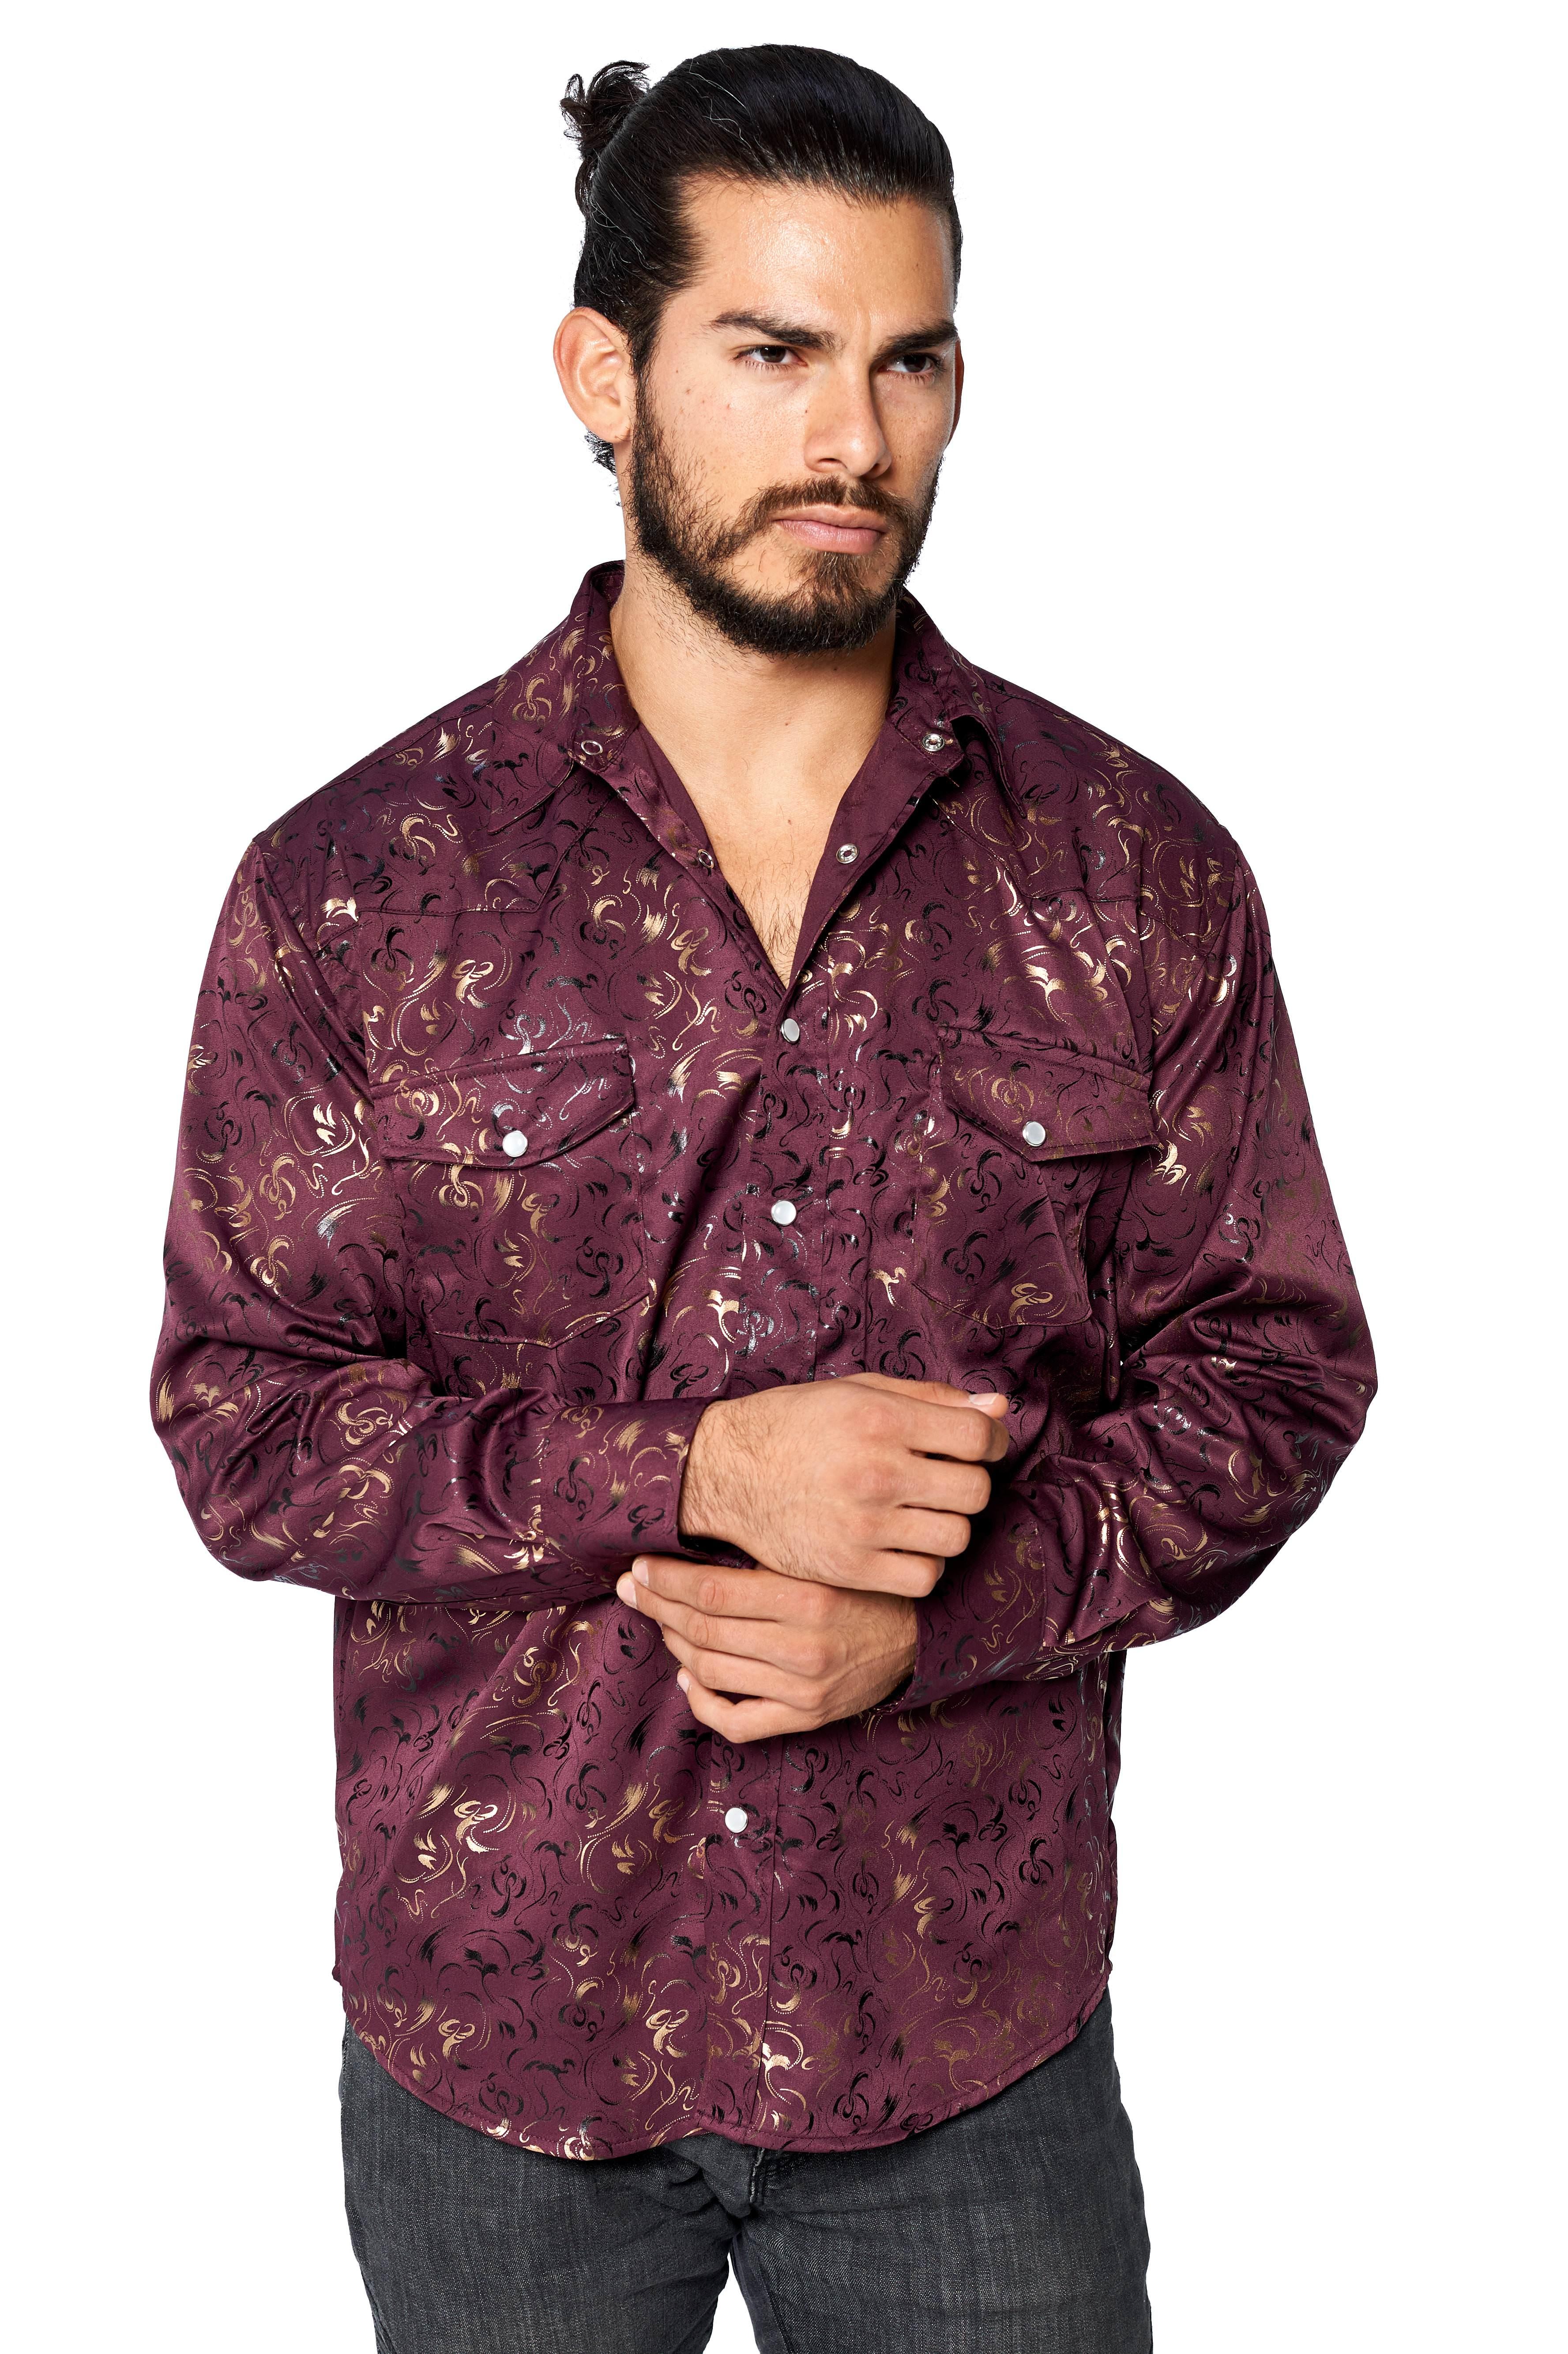 LW-Men-039-s-Pearl-Snap-Tribal-Stylish-Printed-Woven-Western-Vaquero-Rodeo-Shirt thumbnail 11